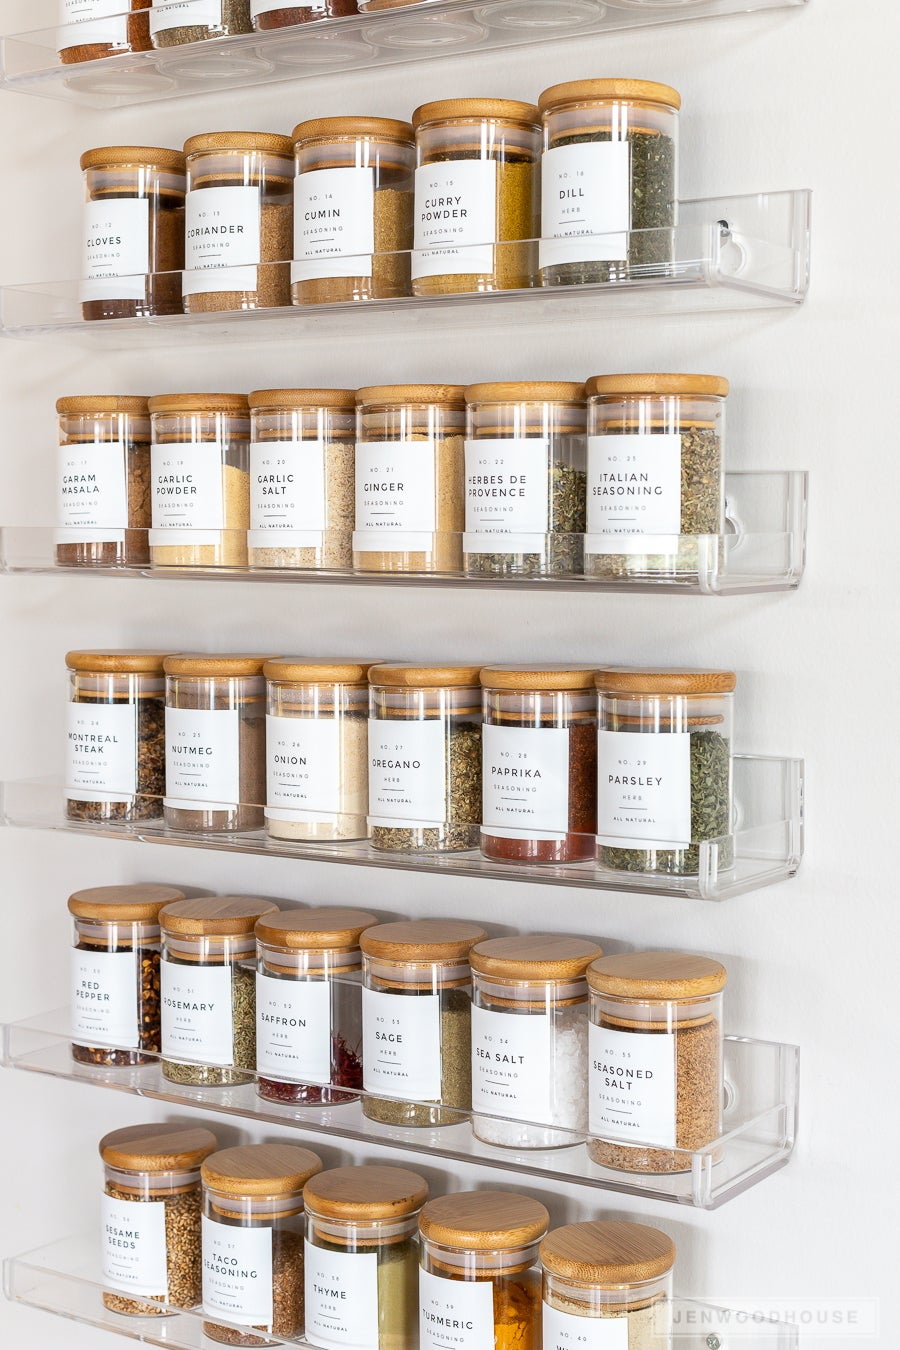 spices on acrylic shelves